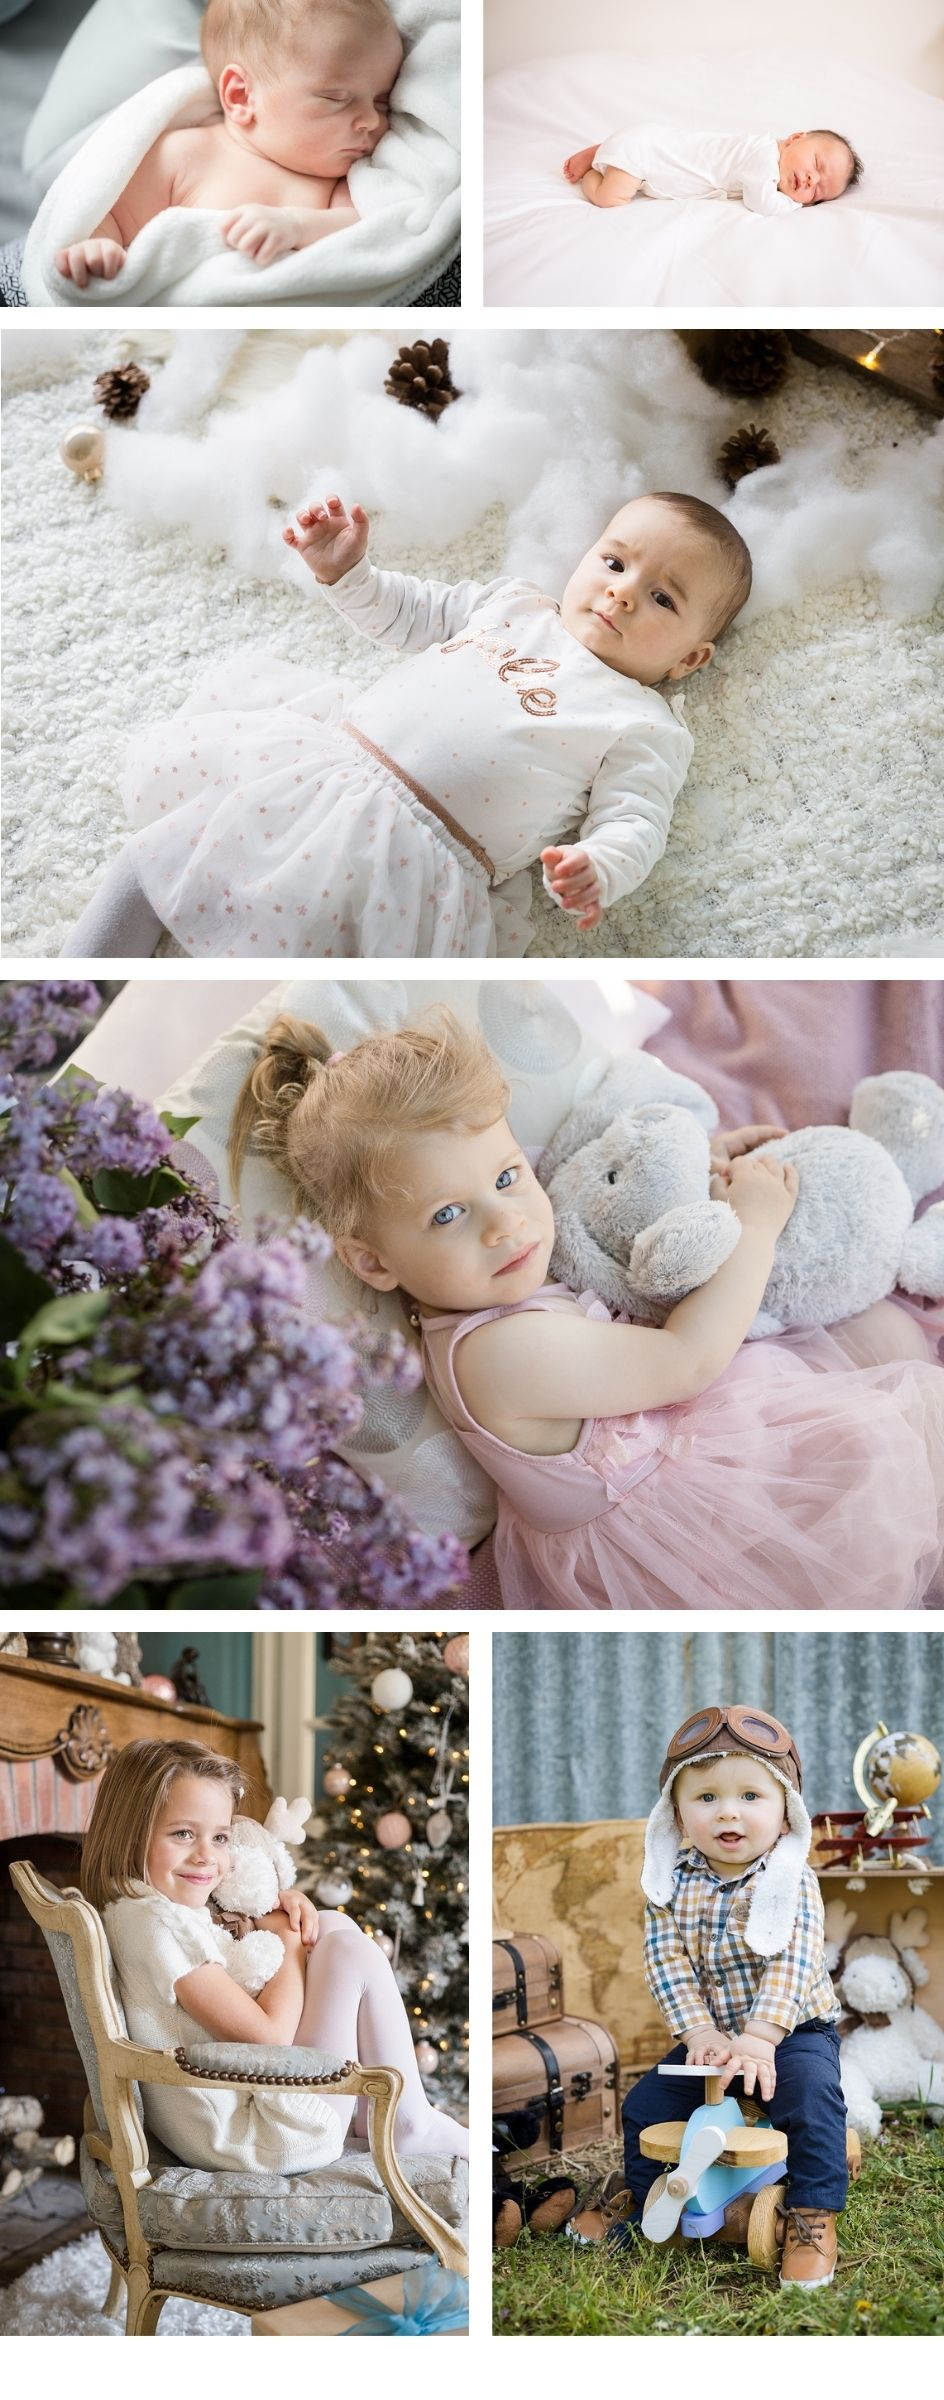 Shooting-photo-en-famille-Virgirnie-Laurencin-Photographe-a-domicile